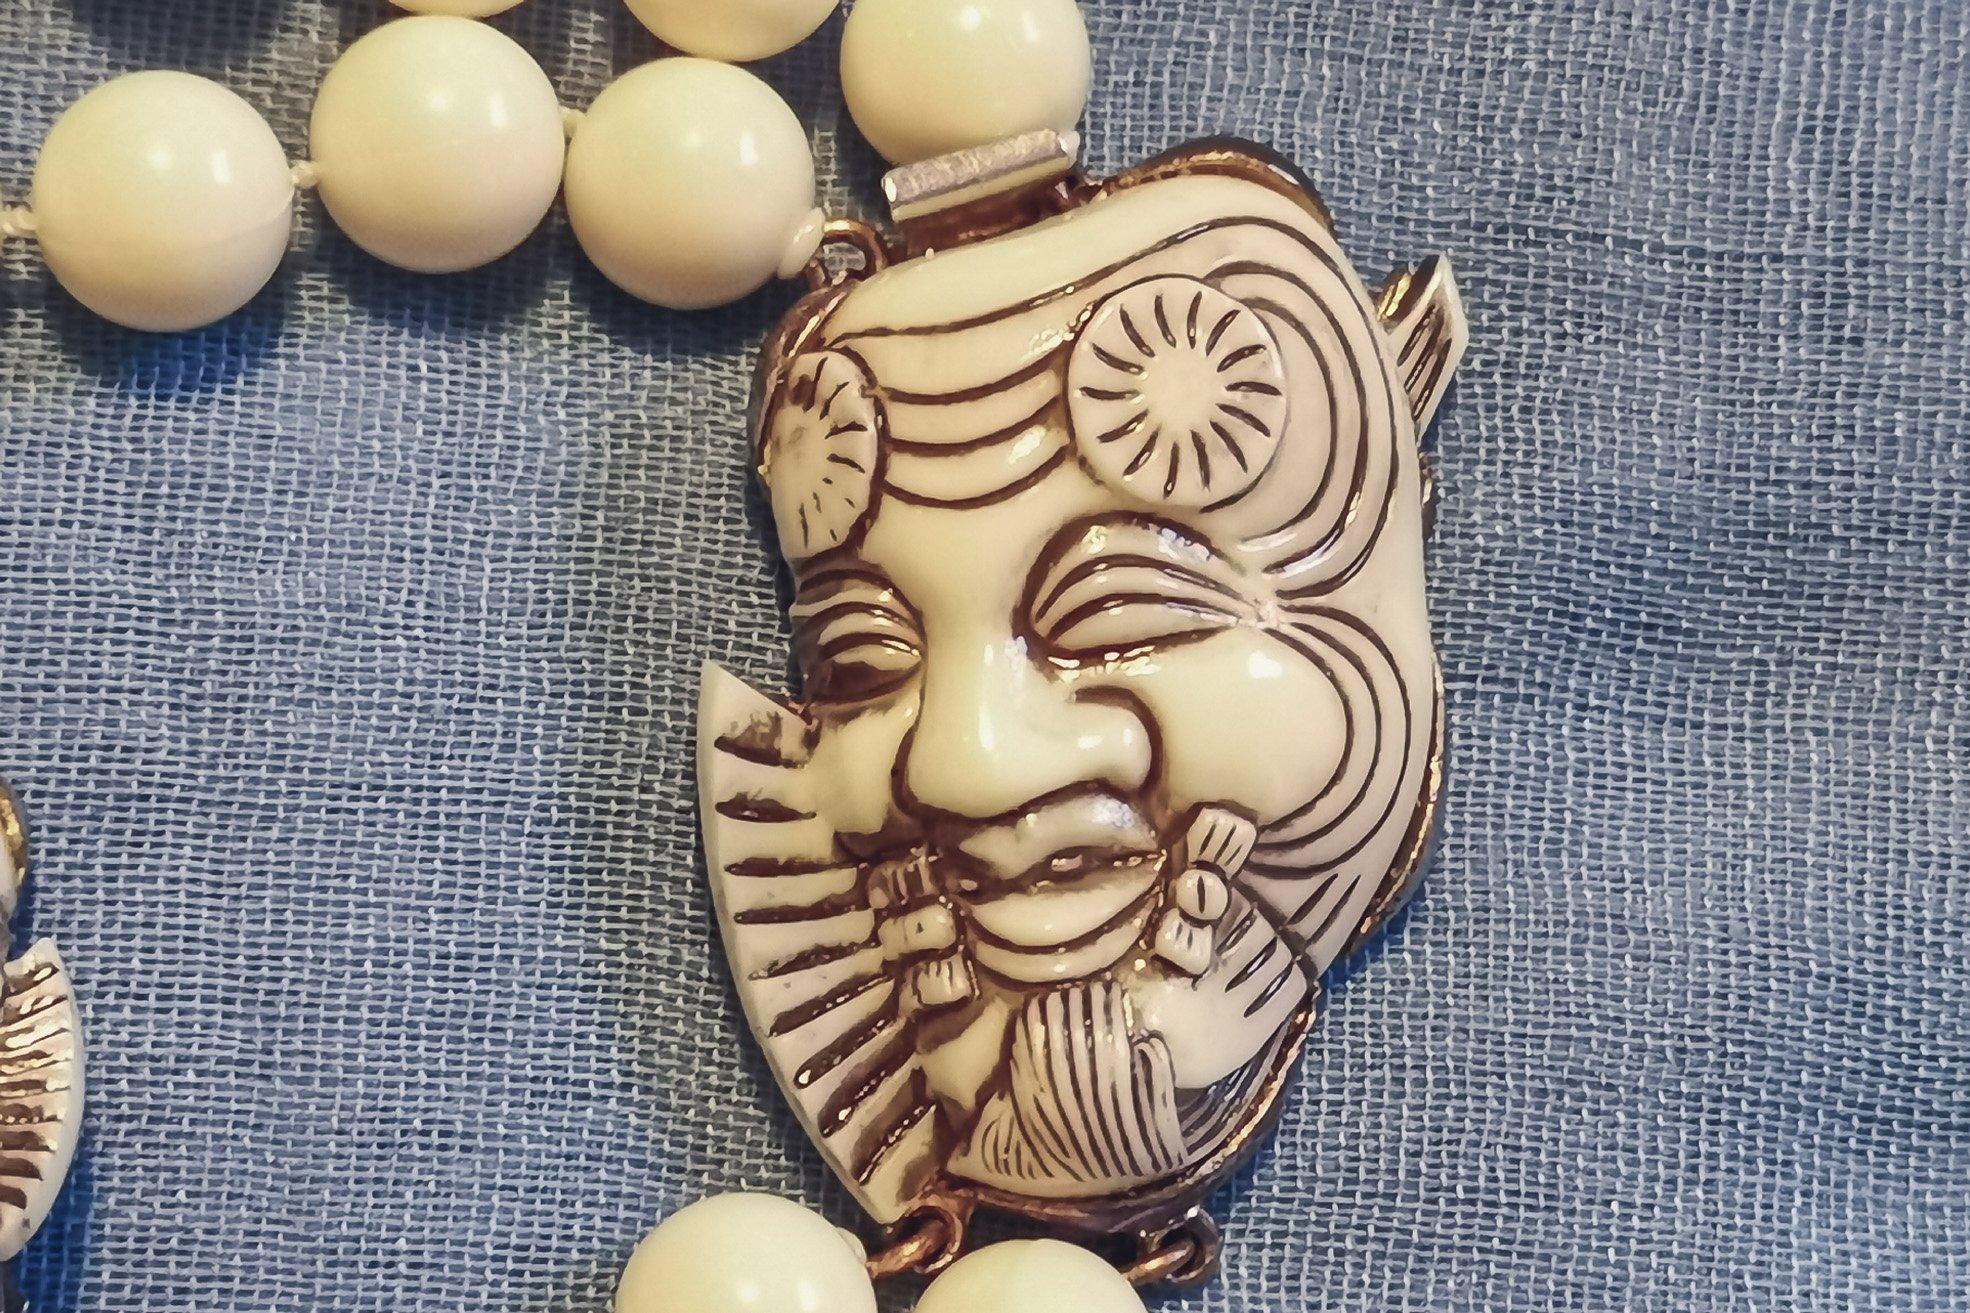 selro-selini-noh-mask-necklace-set